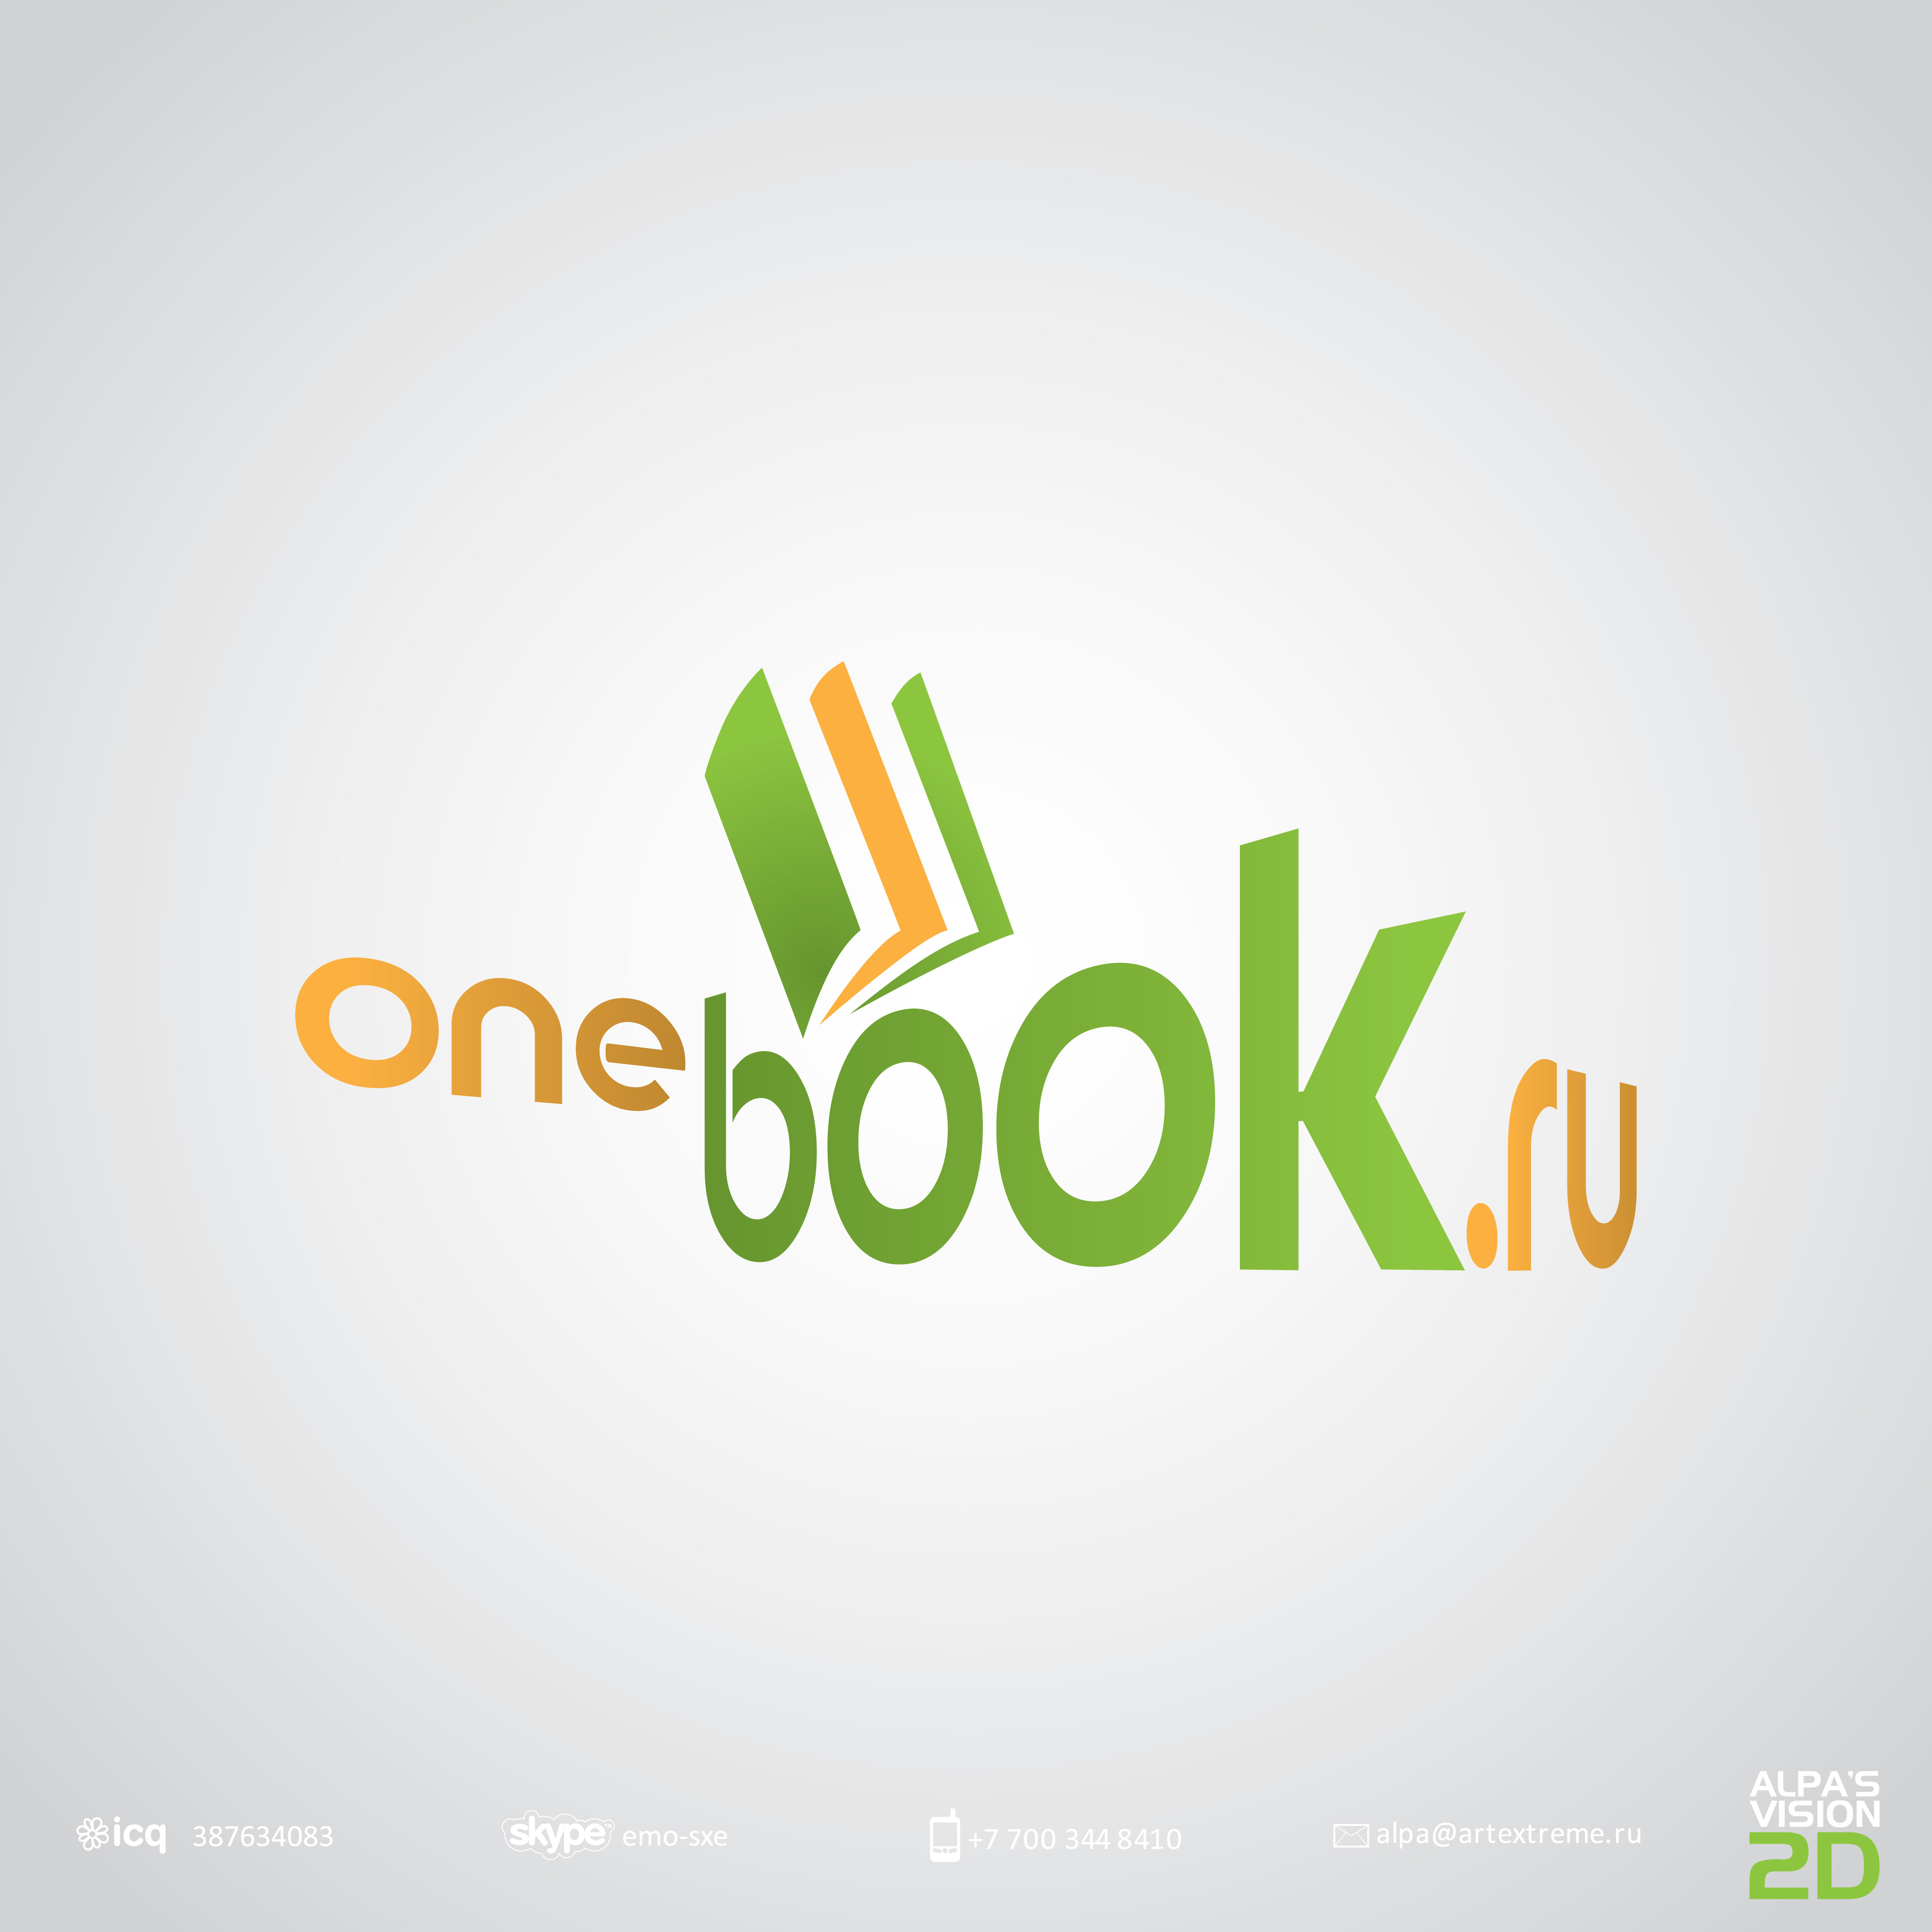 Логотип для цифровой книжной типографии. фото f_4cc0fa753e5e6.jpg